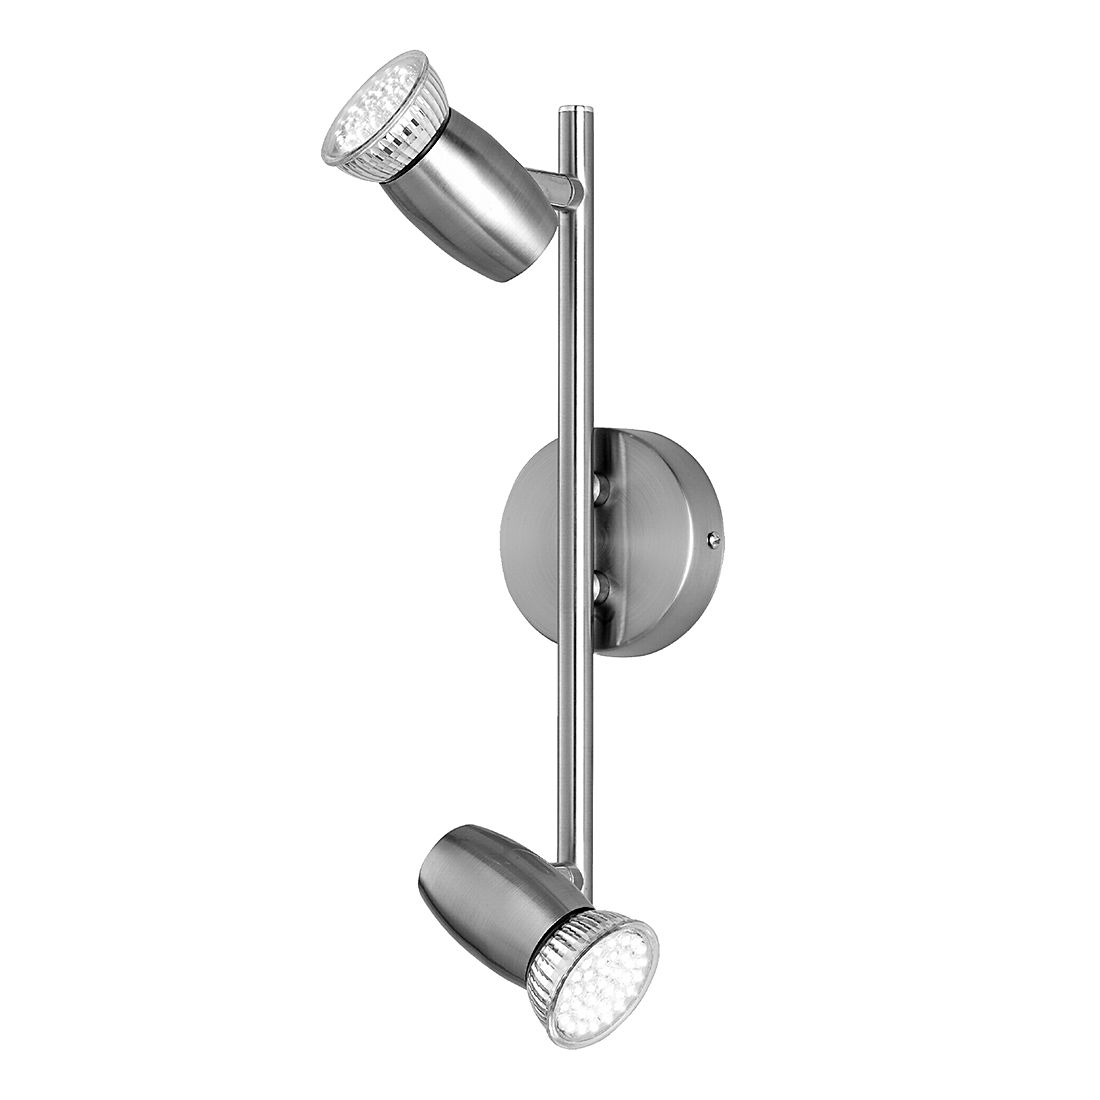 LED-Balken - 2-flammig, Trio